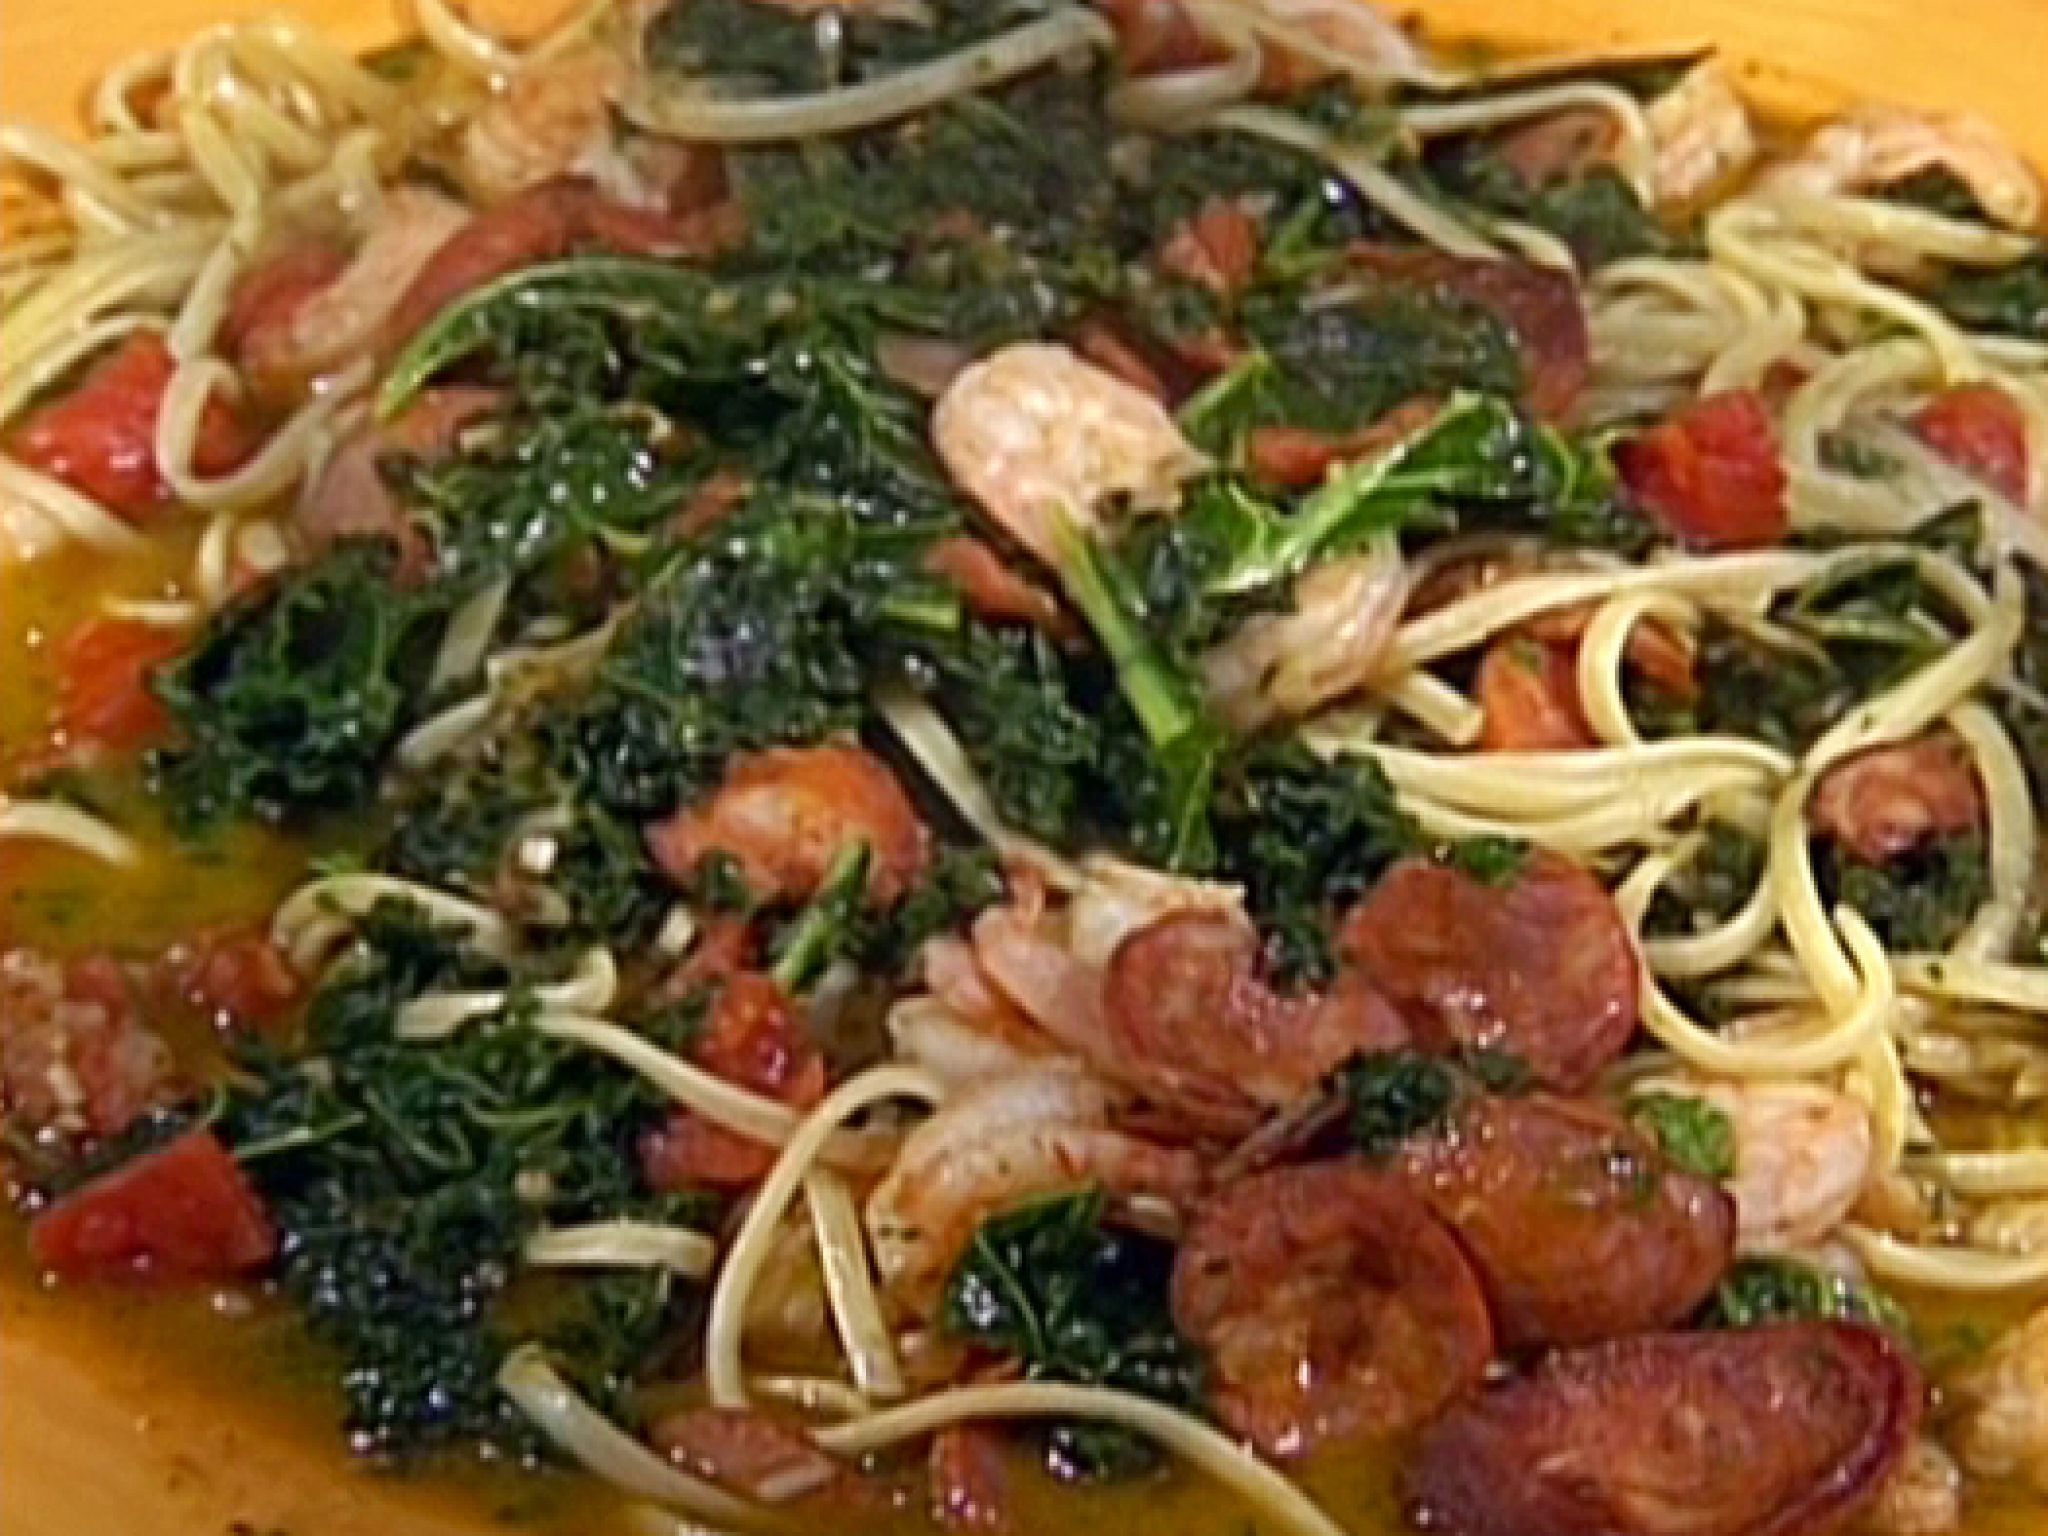 Shrimp and pasta recipe food network